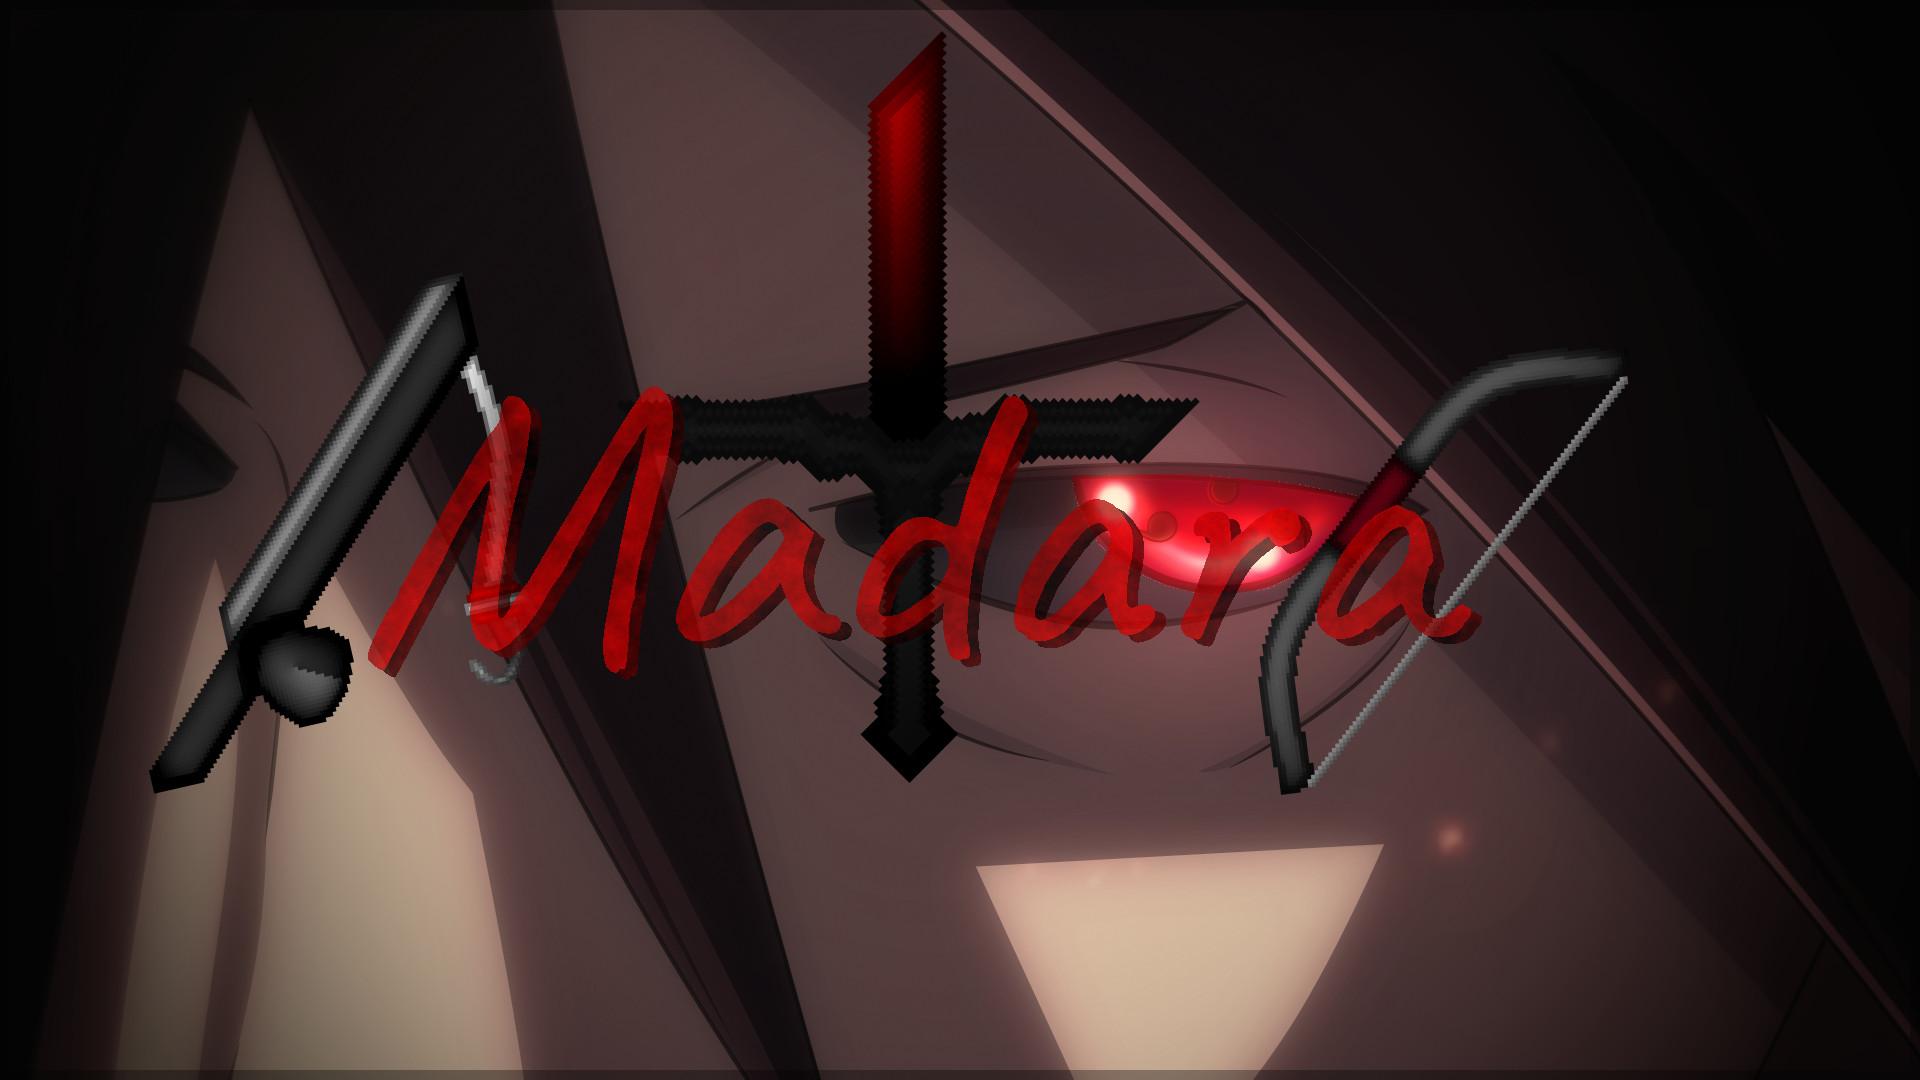 Madara [128x]